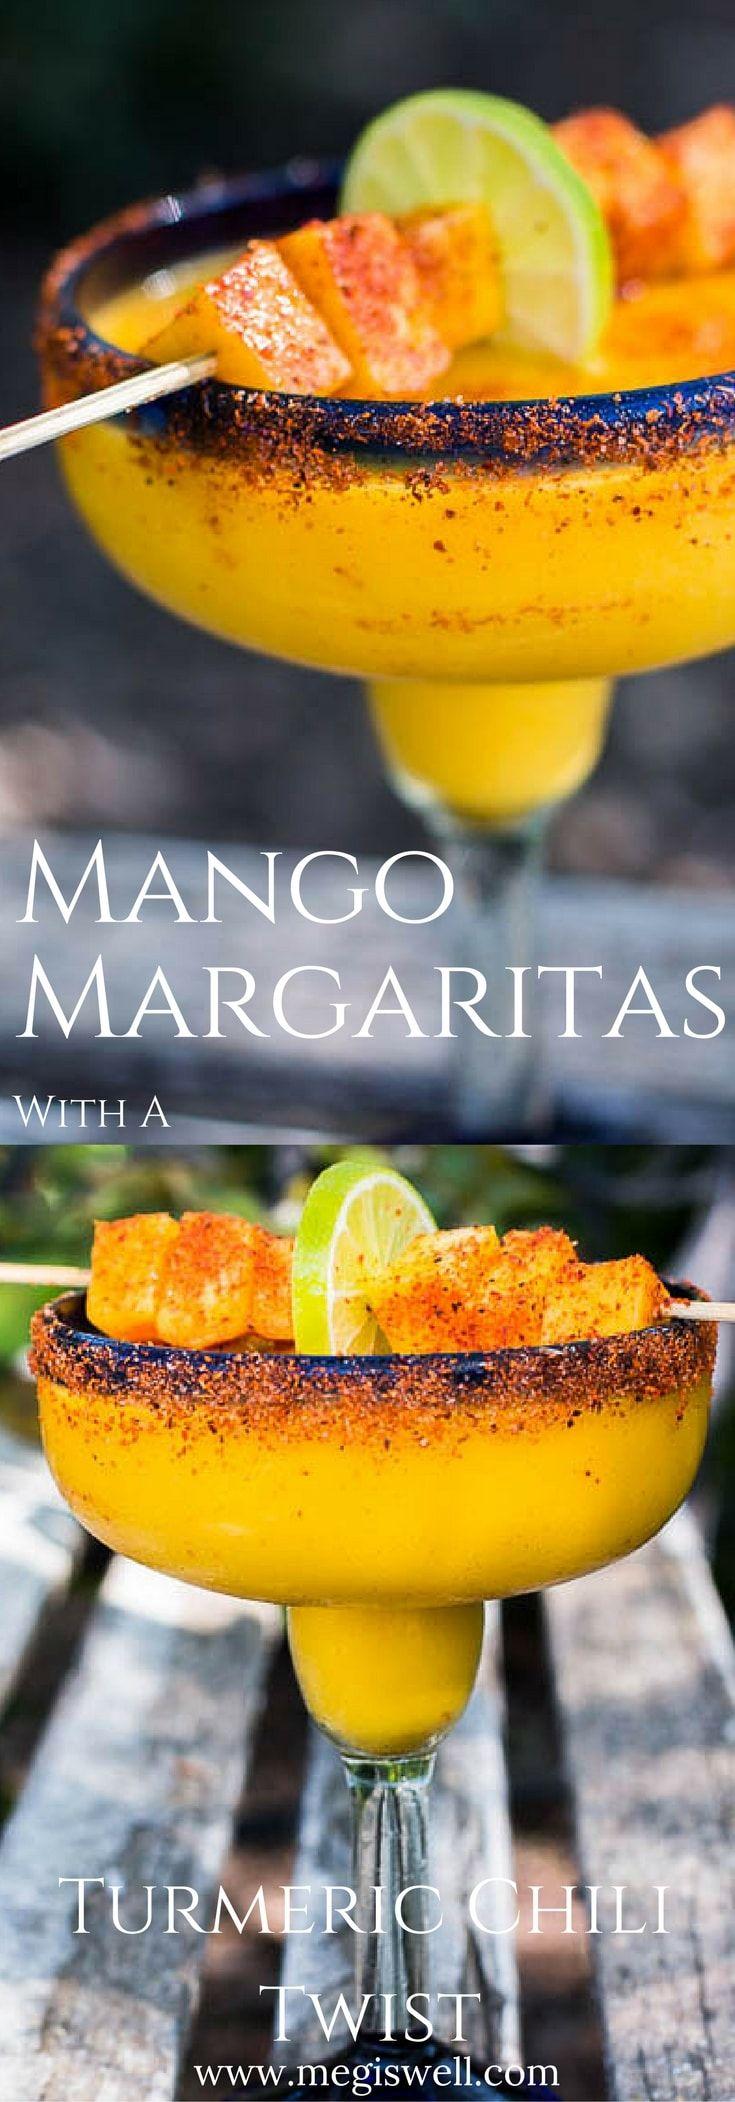 Mango Margaritas with a Turmeric Chili Twist